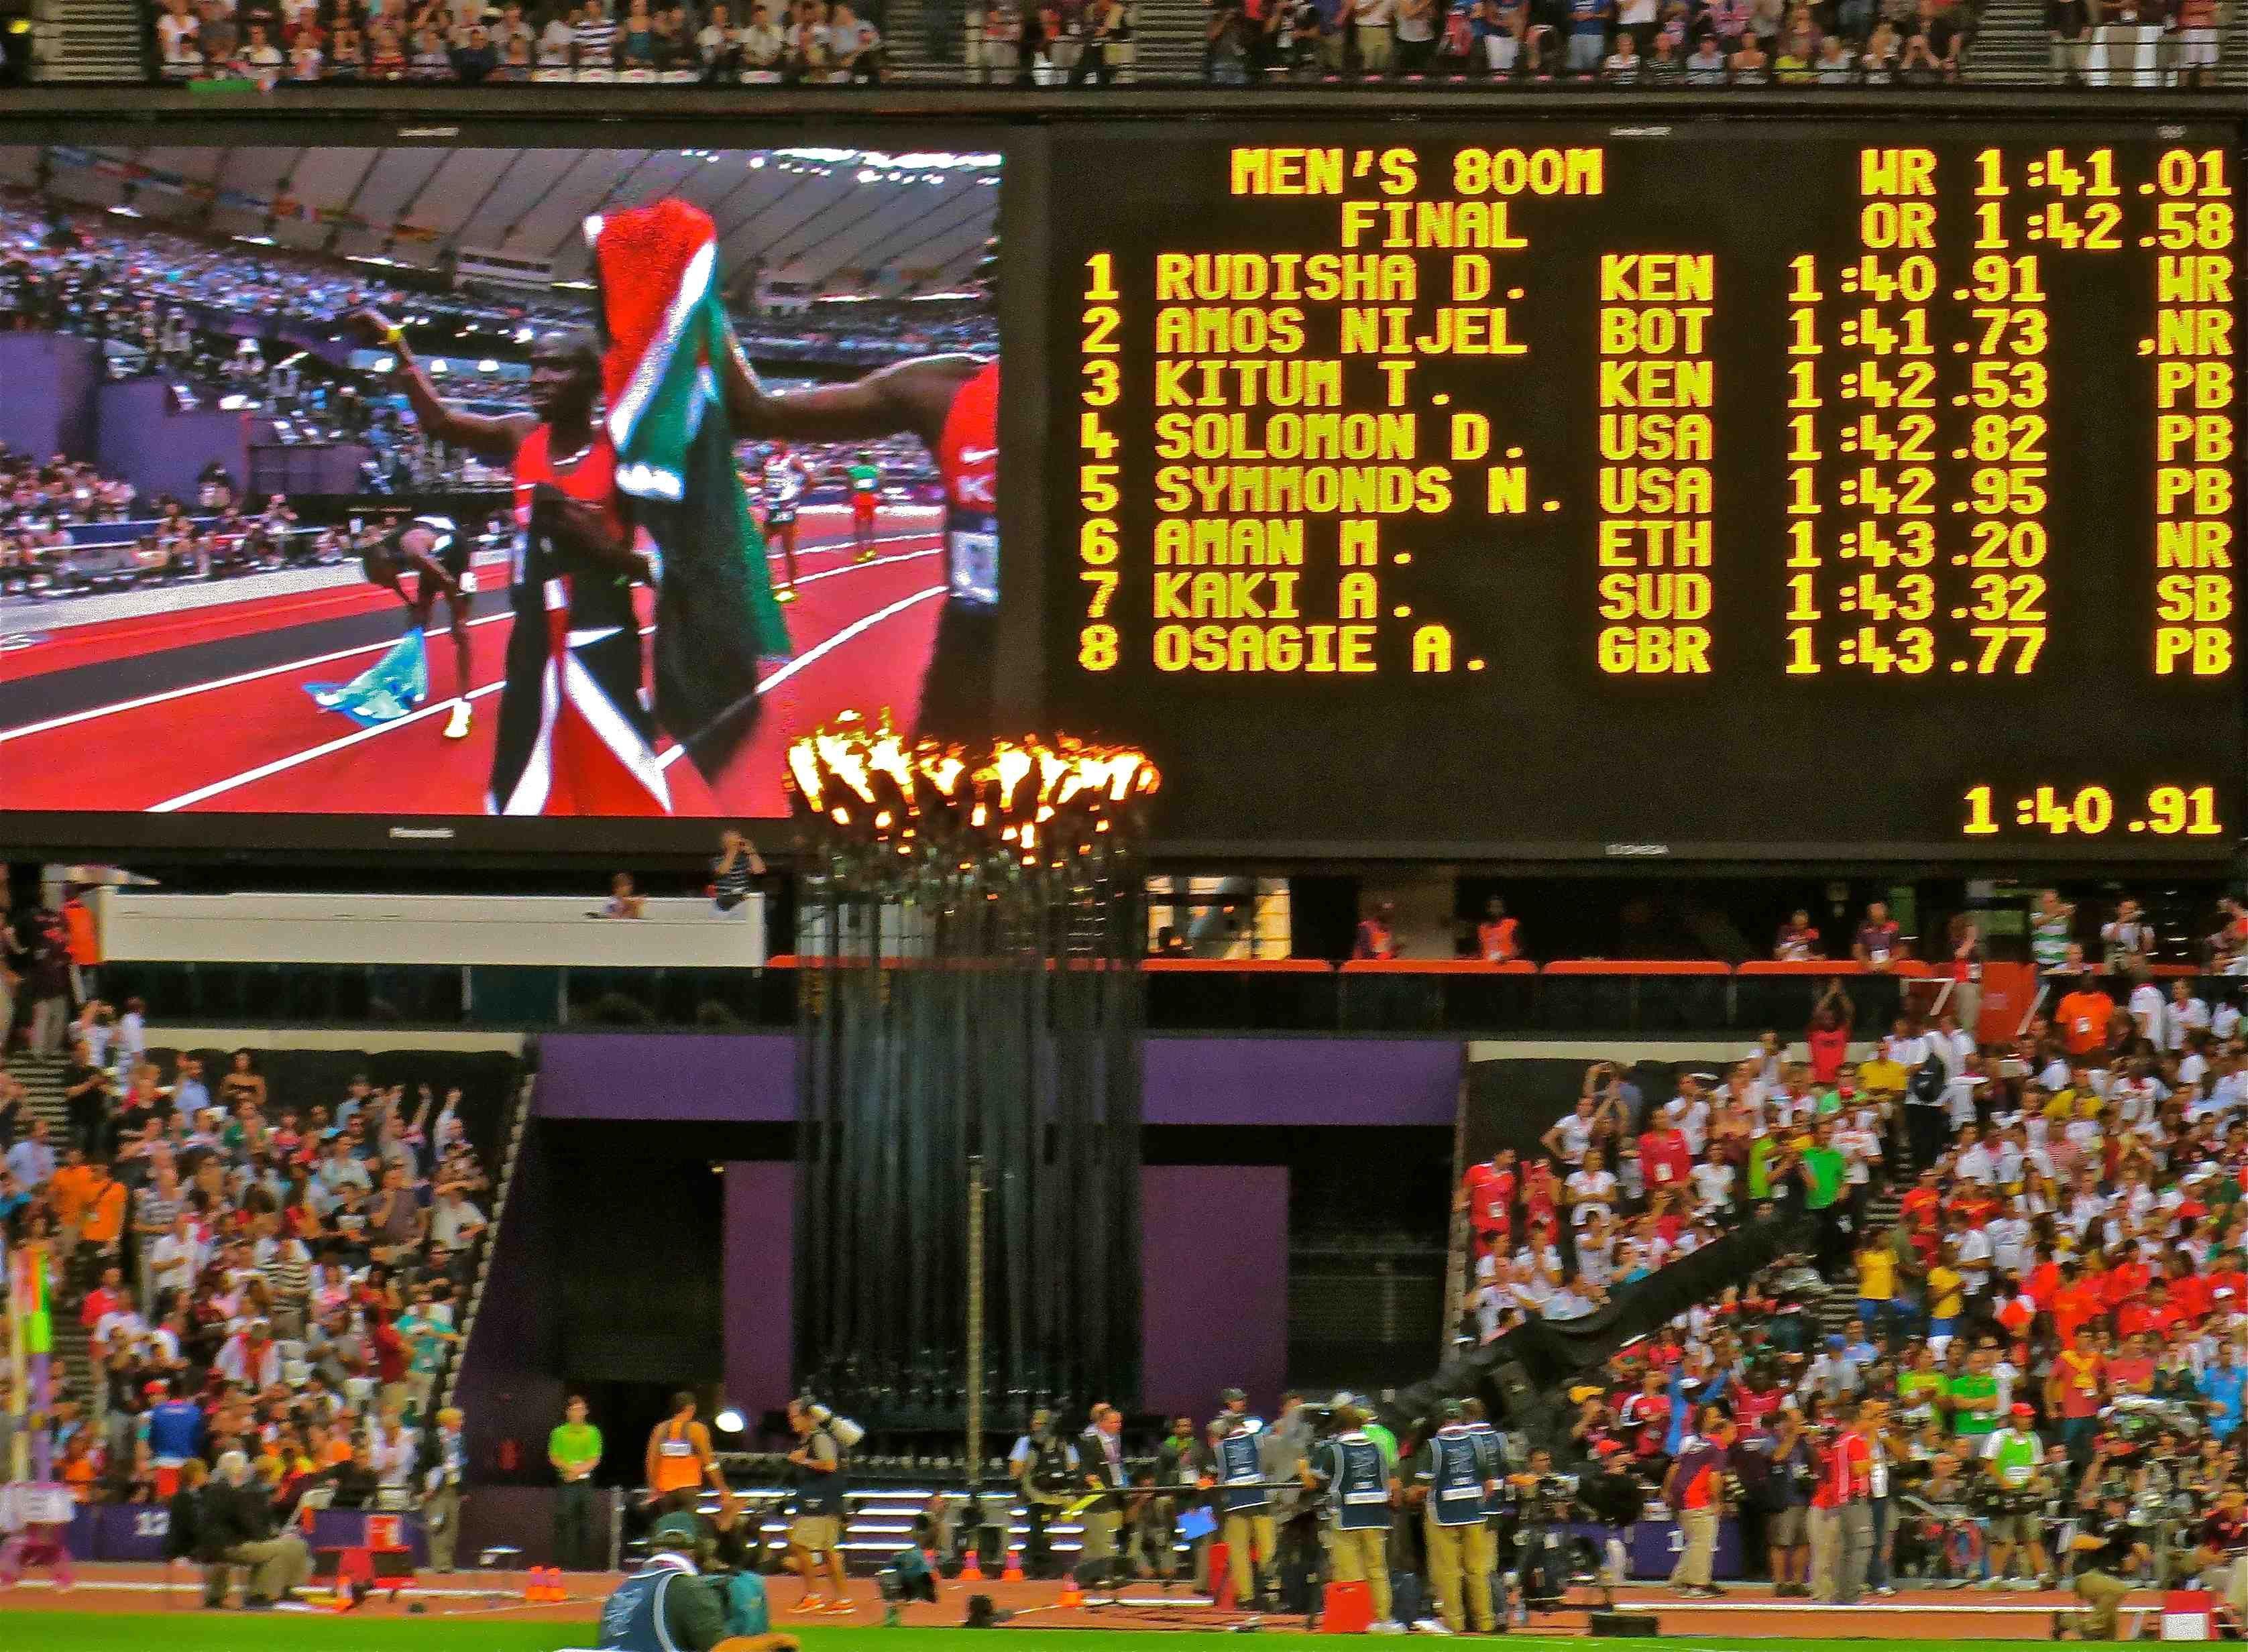 Olympics London 2012 Mens 800m final, the fastest 800m race ever run!  8: UK's Osagie gains Personal Best  7: Sudan's Kaki gains Season's Best  6: Ethiopia's Aman sets new National Record  5: USA's Symmonds gains Personal Best  4: USA's Solomon gains Personal Best  3: Kenya's Kitum gains Personal Best - at age 17, you're looking at a future mega-star when he peaks  2: Botswana's AMOS sets new Nationial Record AND new World Junior Record  1: Kenya's Rudisha BREAKS HIS OWN WORLD RECORD